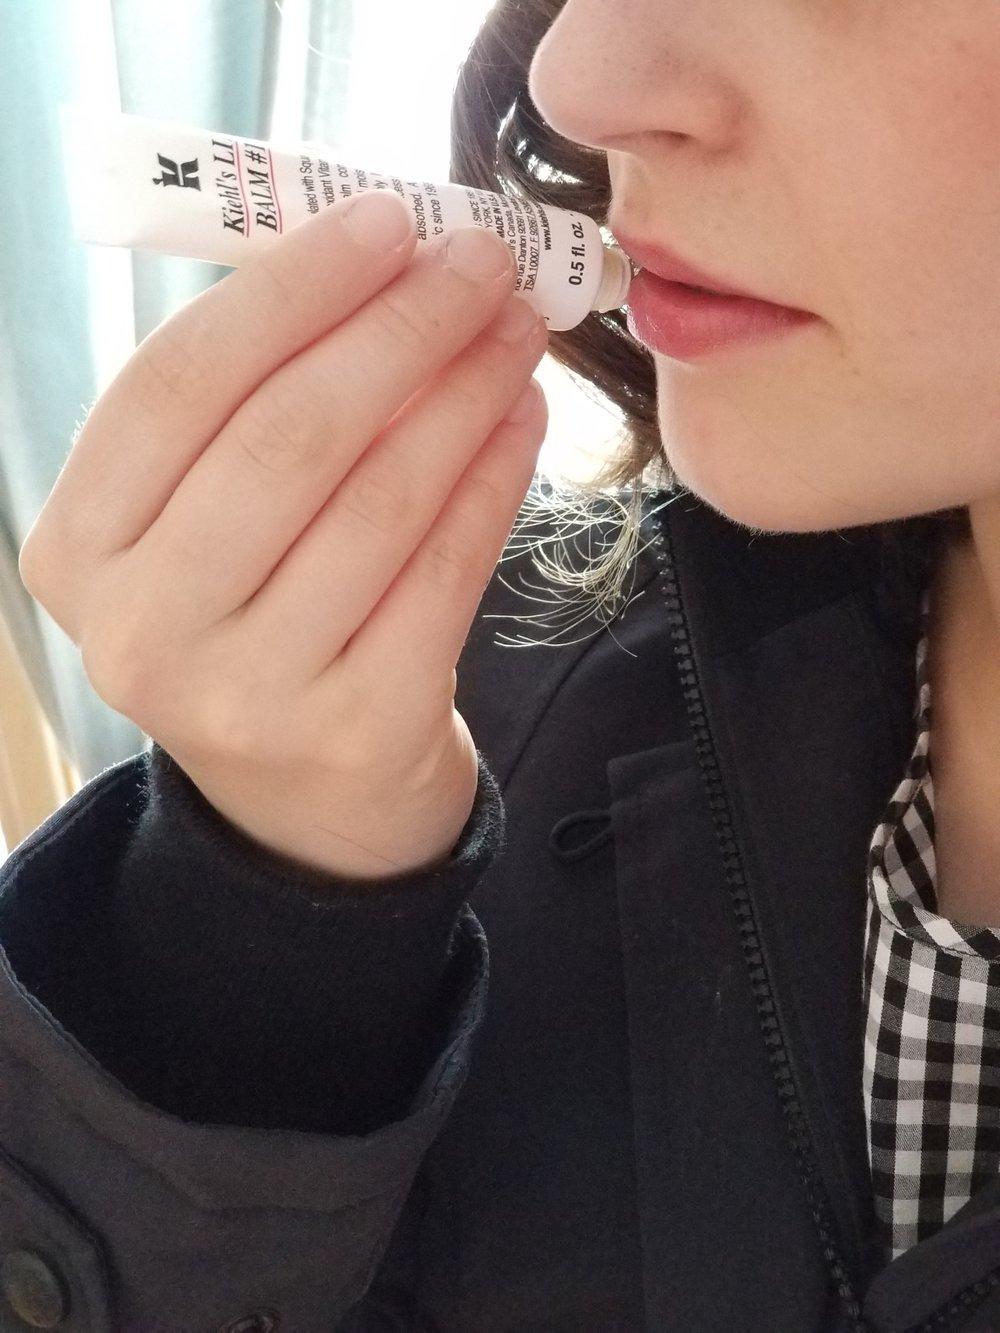 Keihl's Lip Balm #1